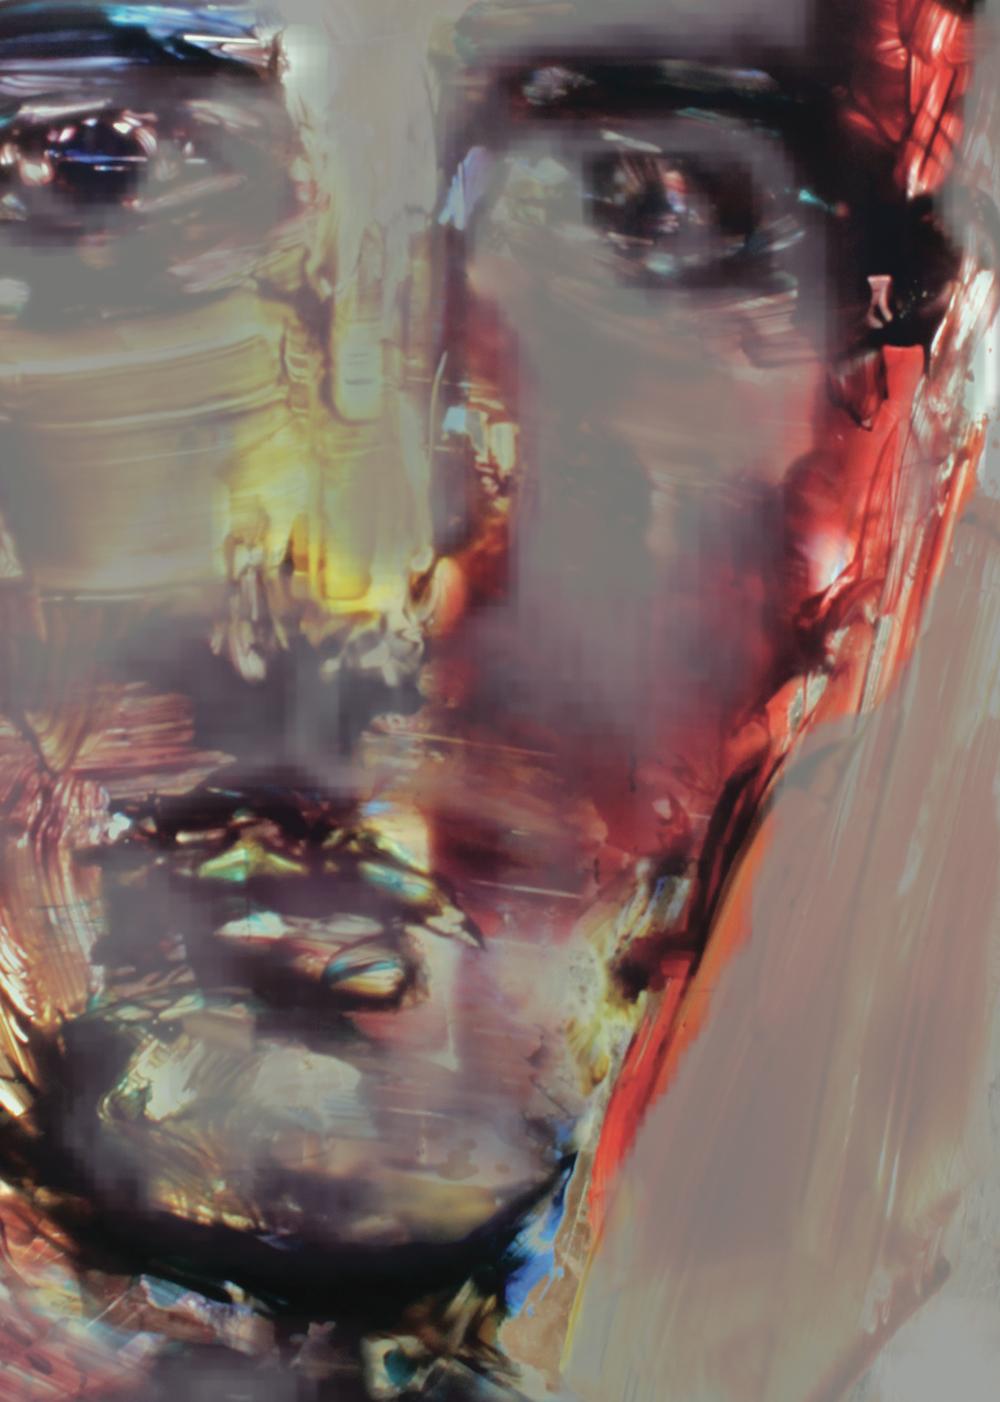 15 Daniel Webster,Self Portrait (Detail) 2014, digital print, acrylic, Japanese ink, triptych: each panel 80 x 57 cm, $5,000